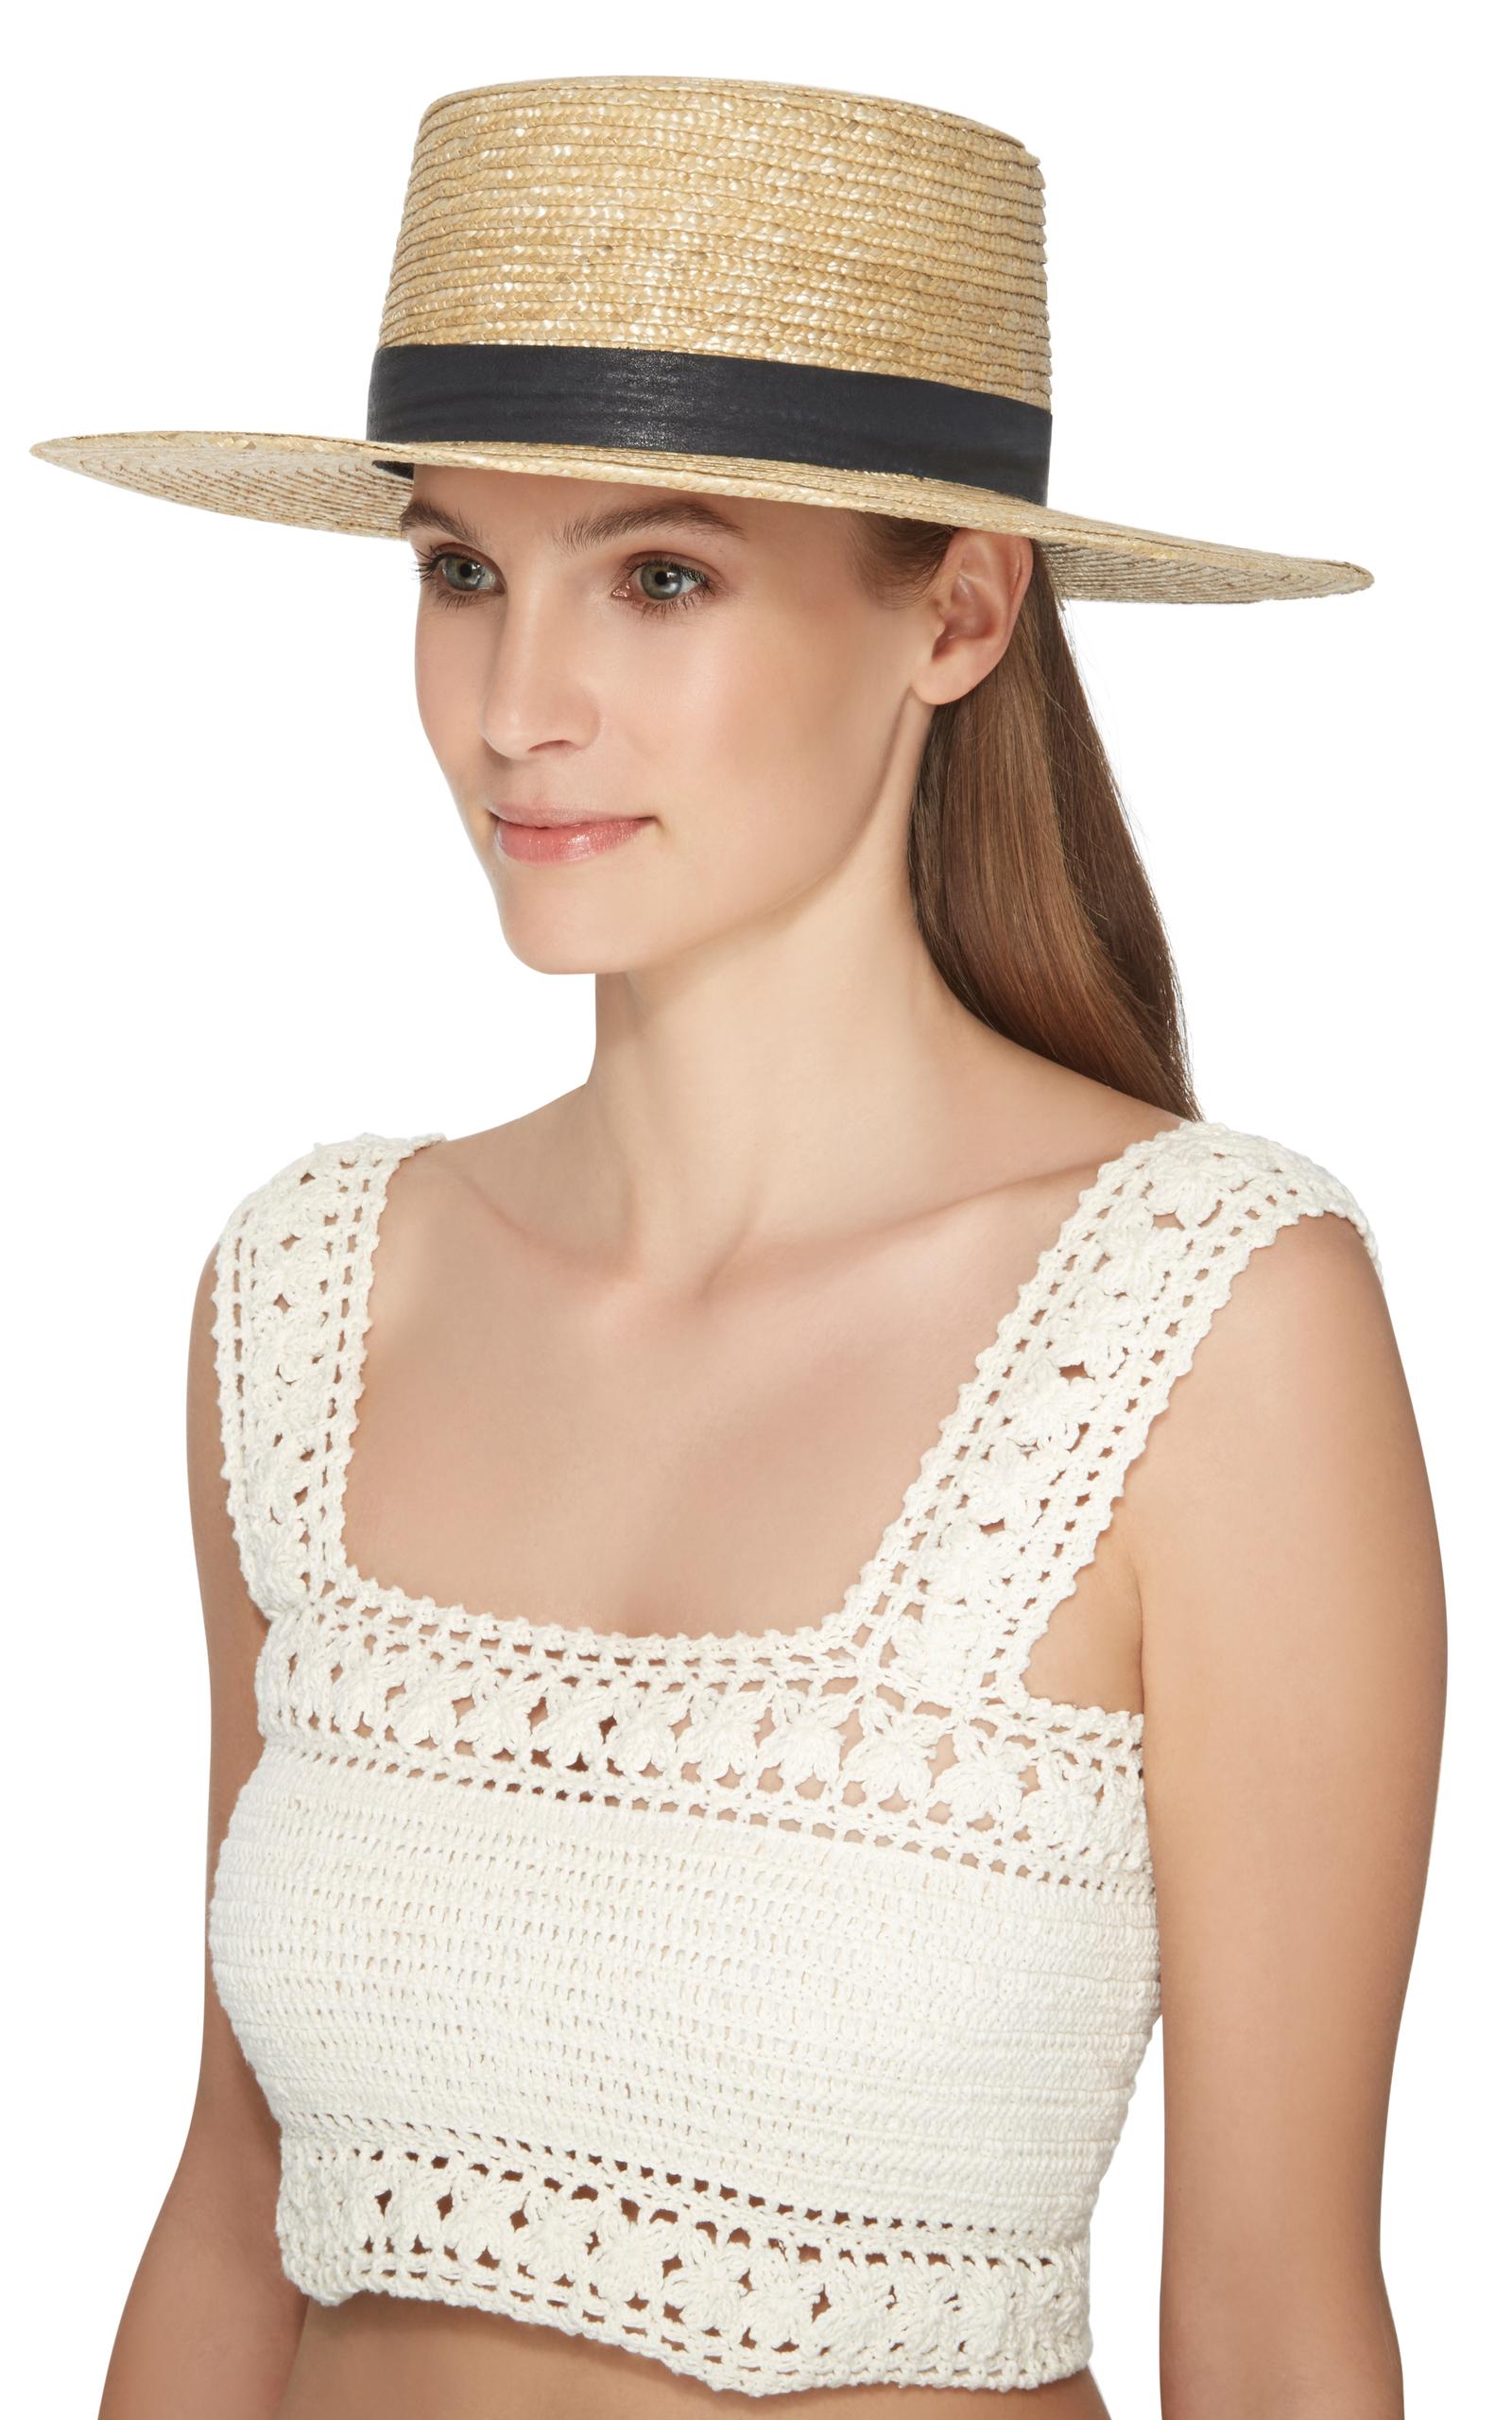 92838890fd8 JANESSA LEONE KLINT BOLERO HAT